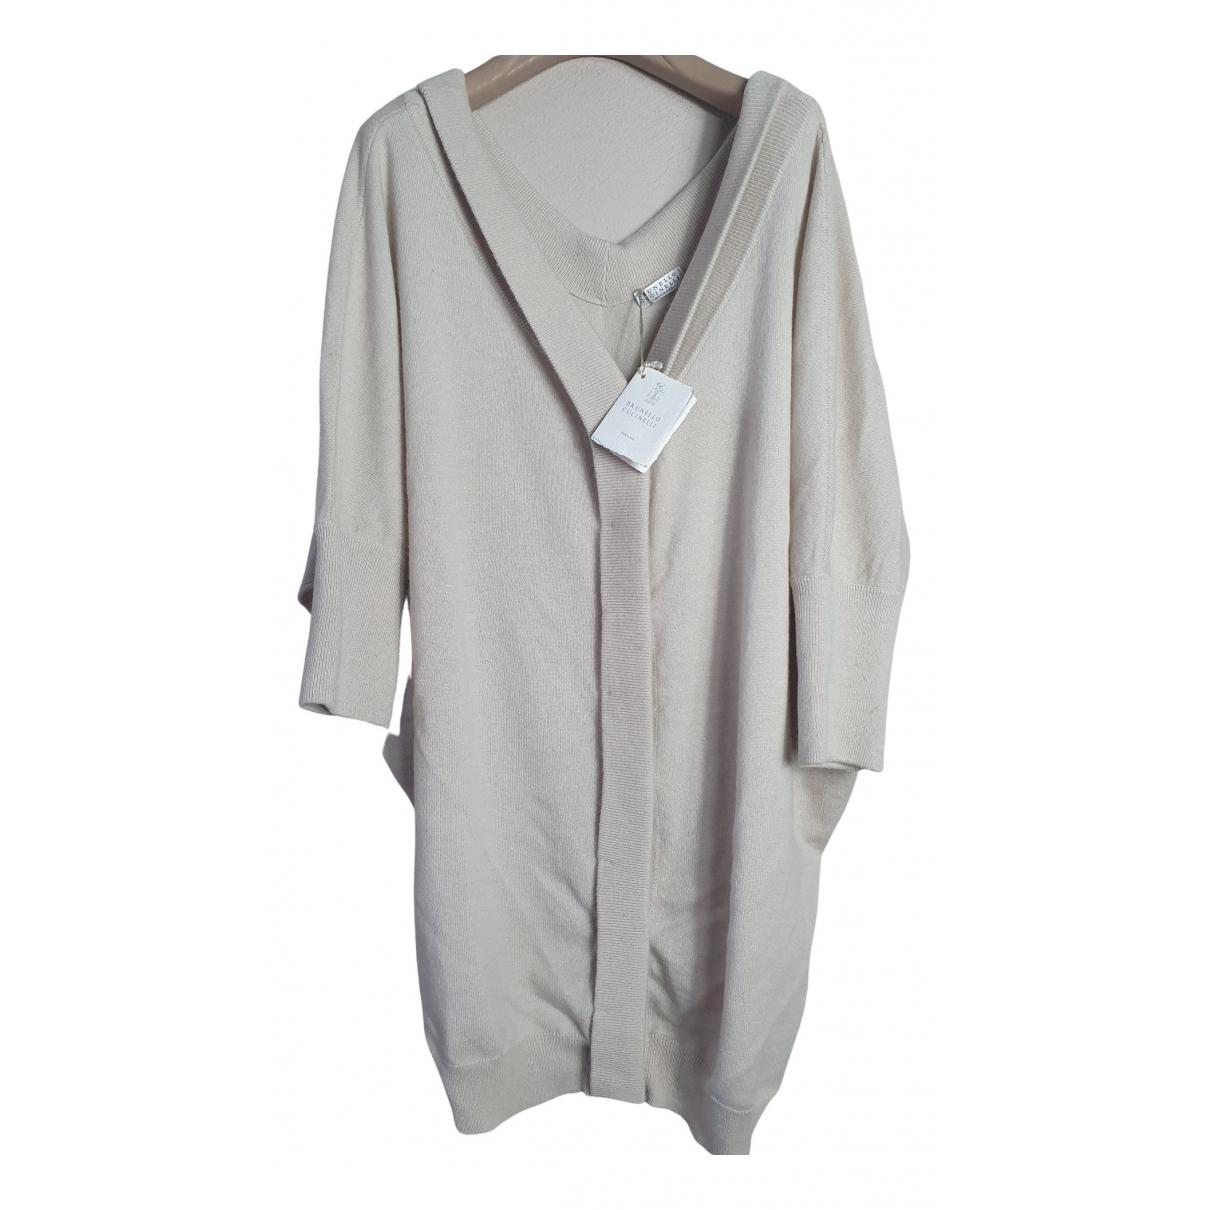 Brunello Cucinelli \N Beige Cashmere Knitwear for Women M International